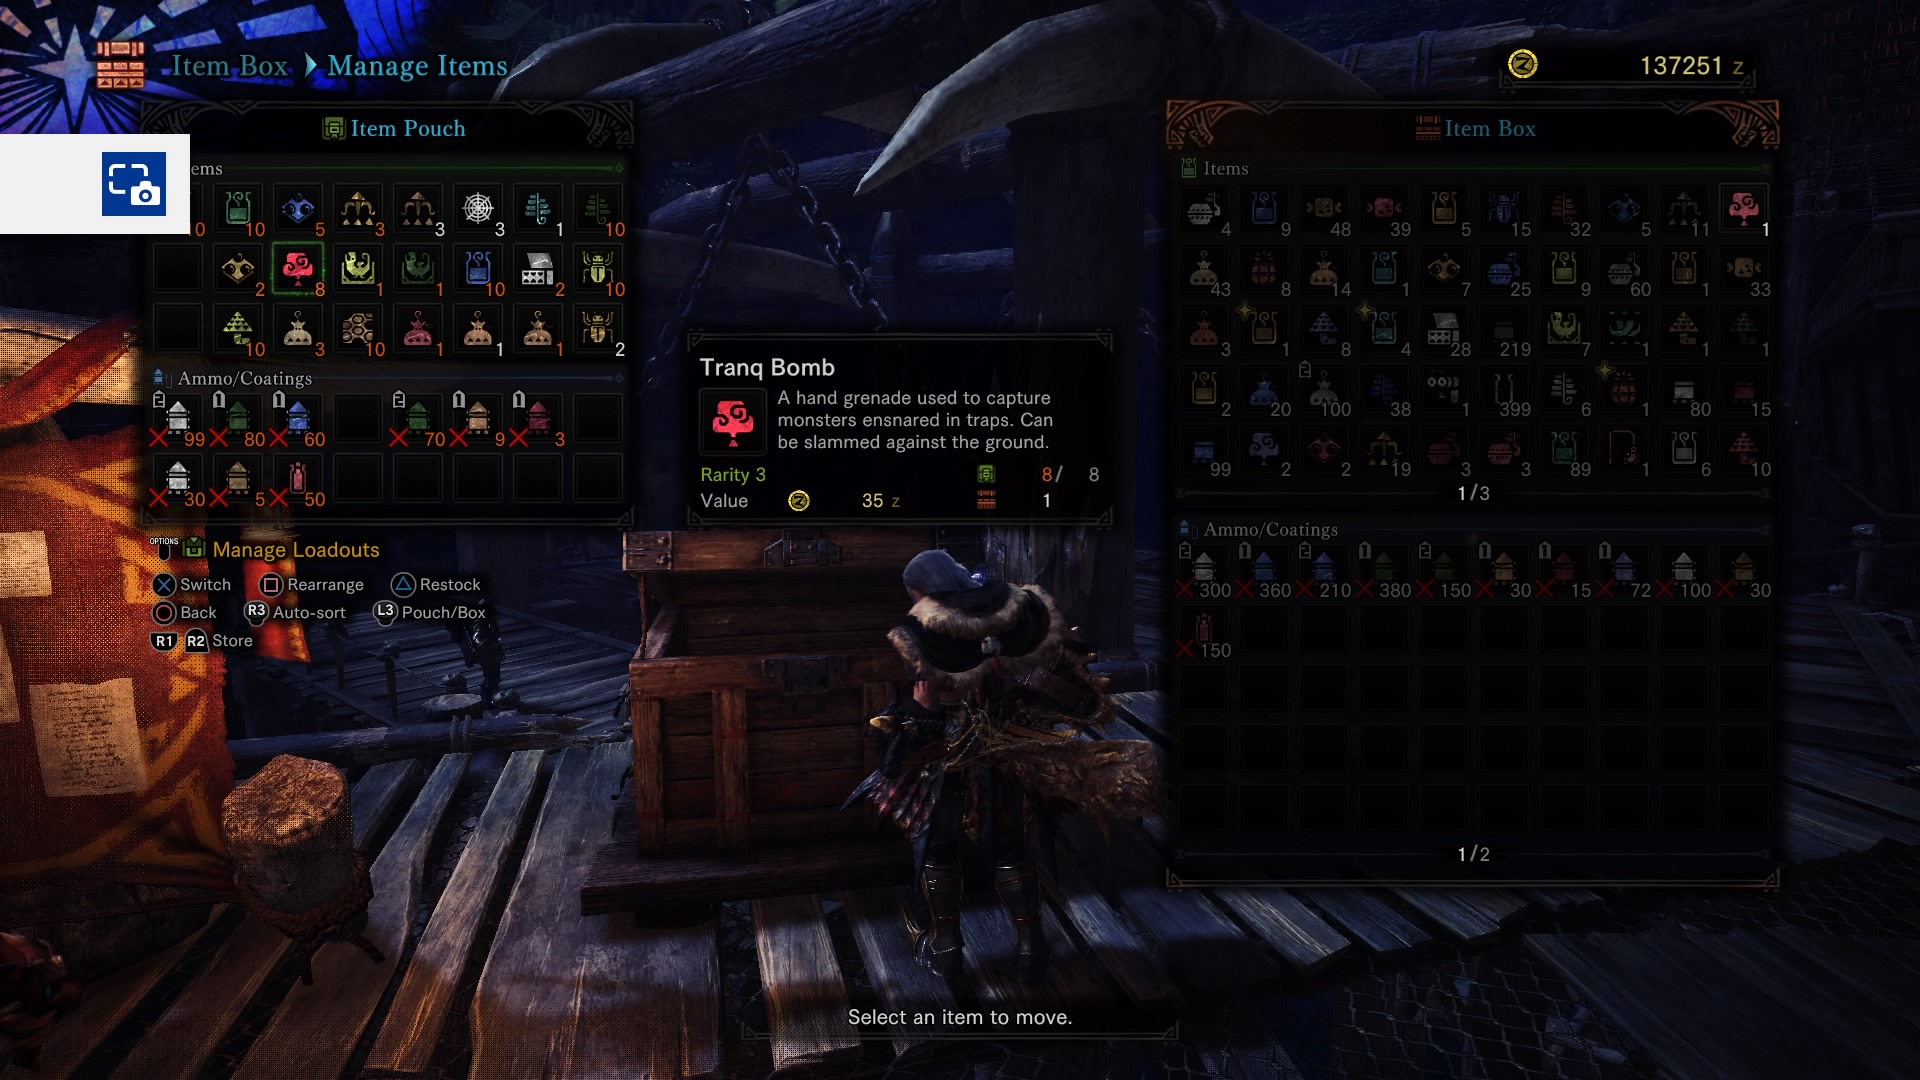 Monster Hunter hunt vs capture - TranqBomb